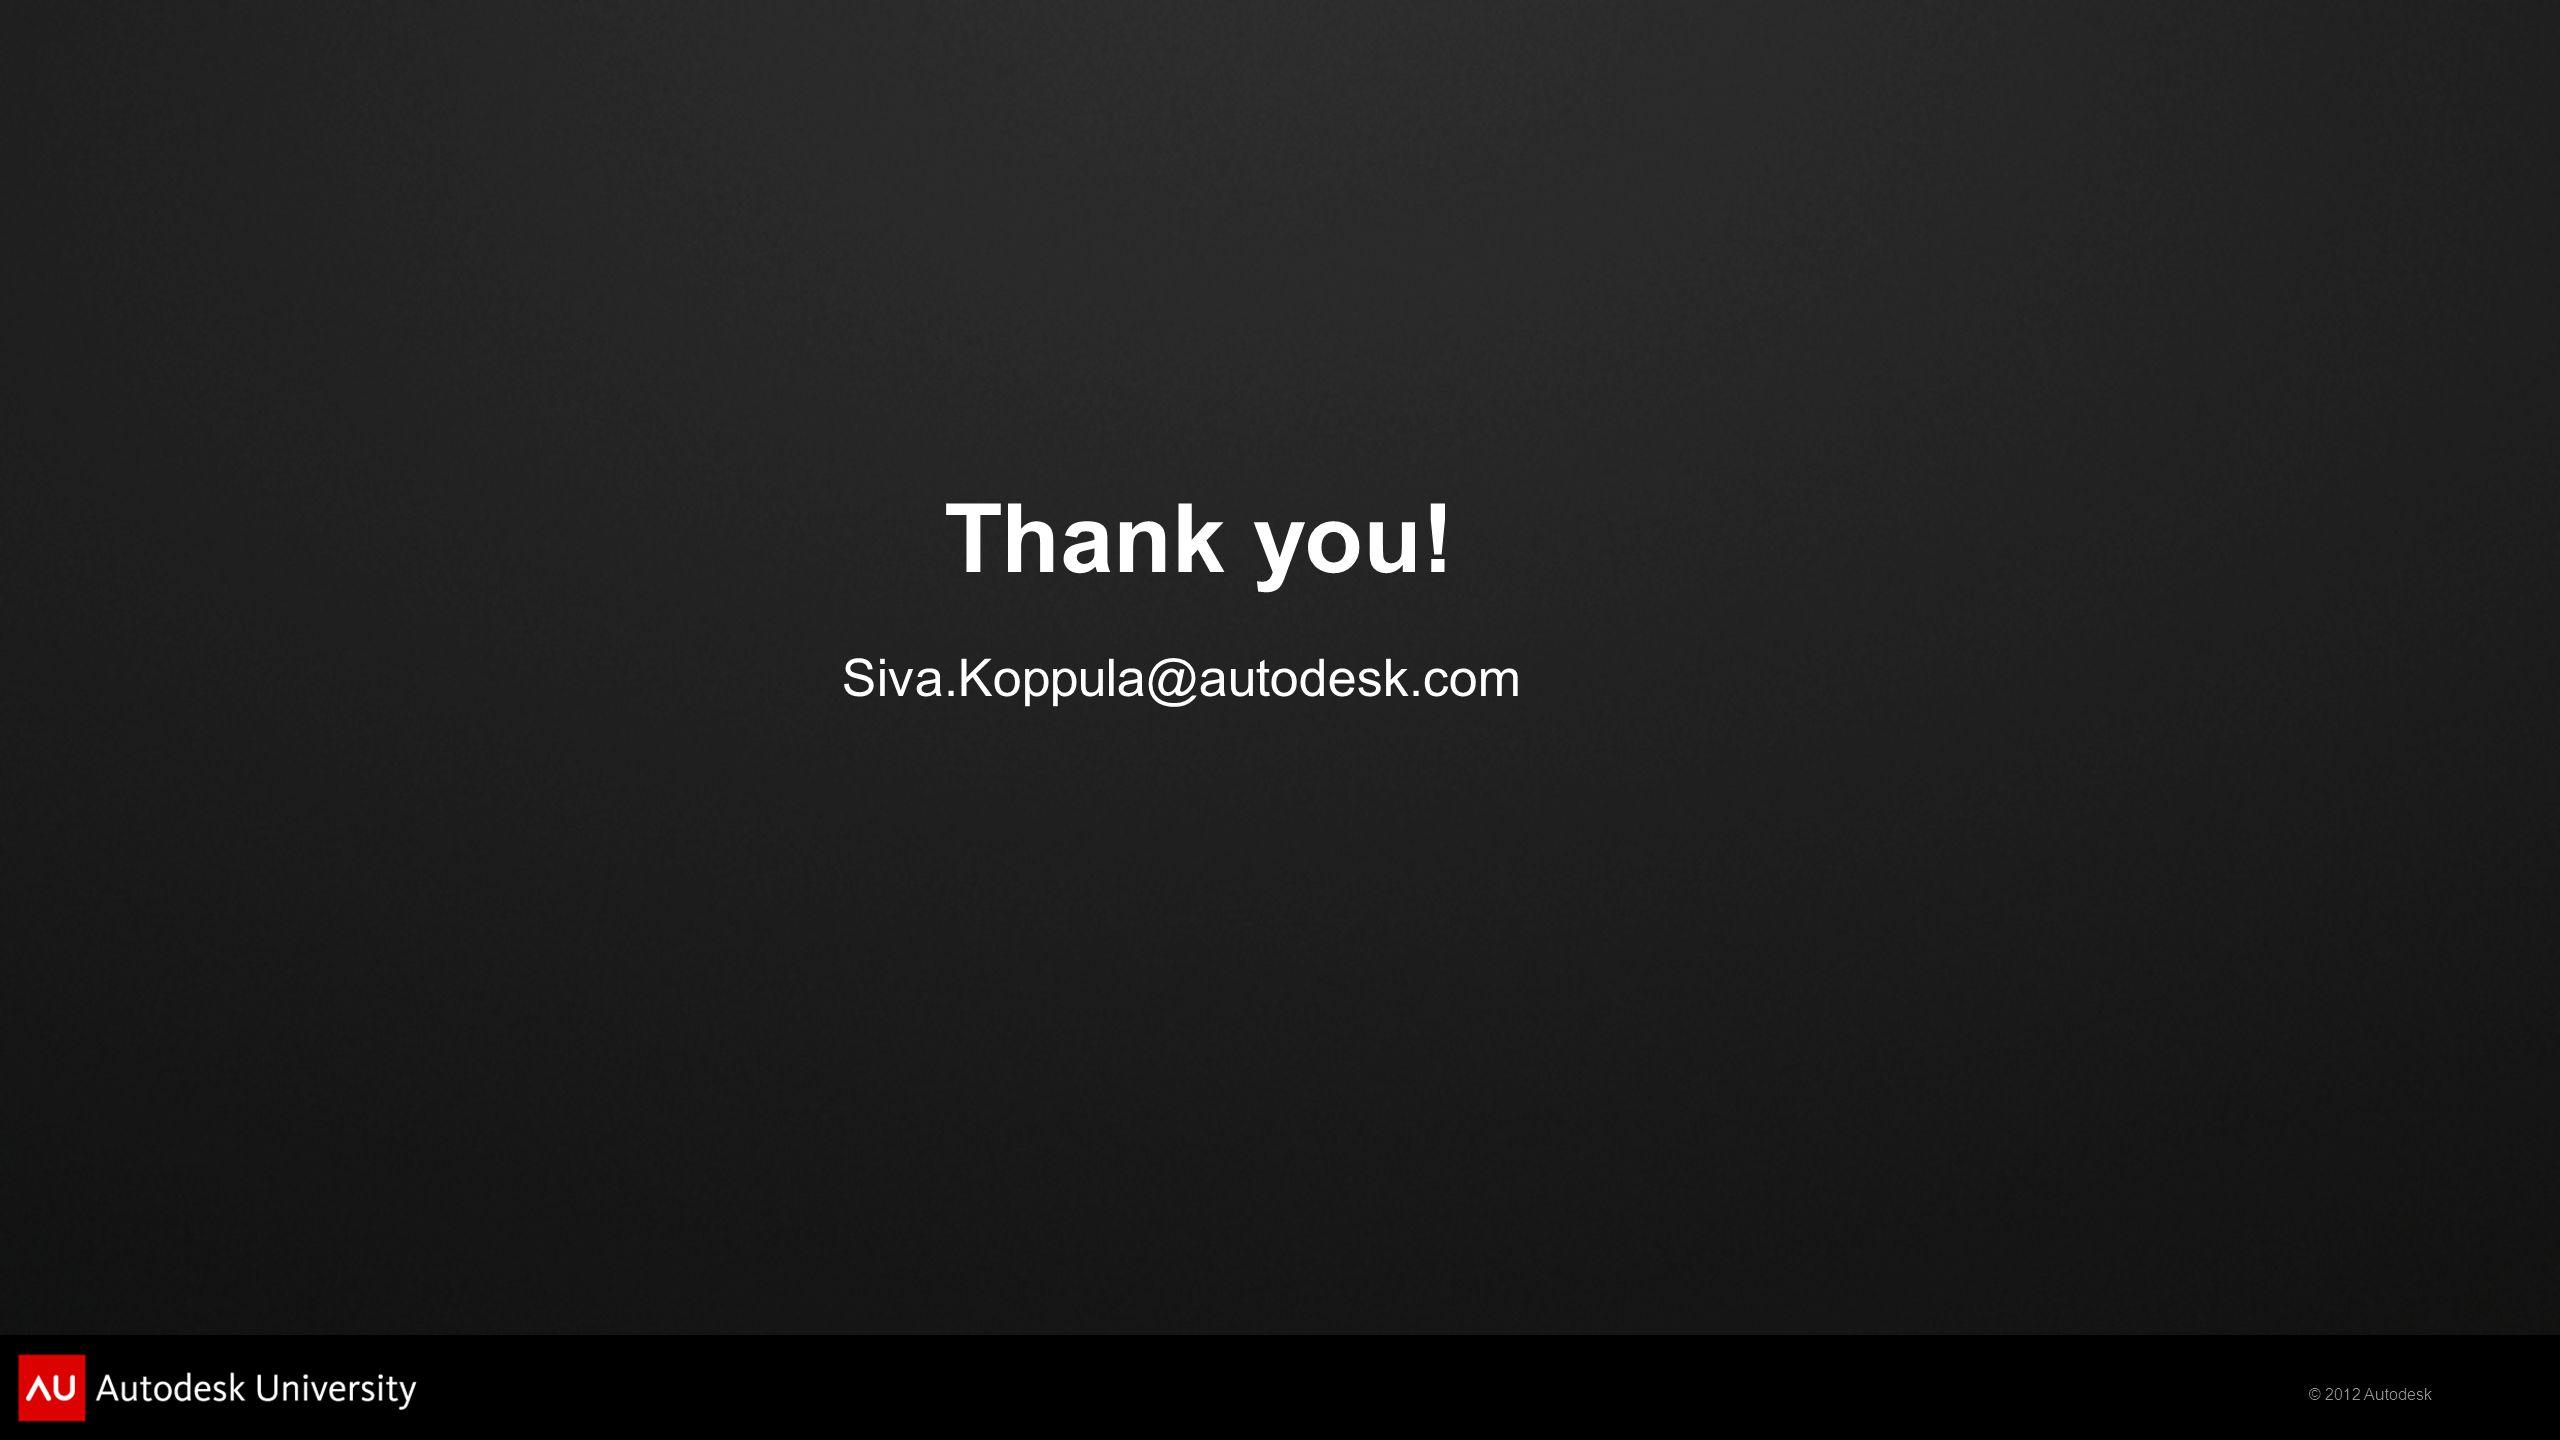 © 2012 Autodesk Thank you! Siva.Koppula@autodesk.com